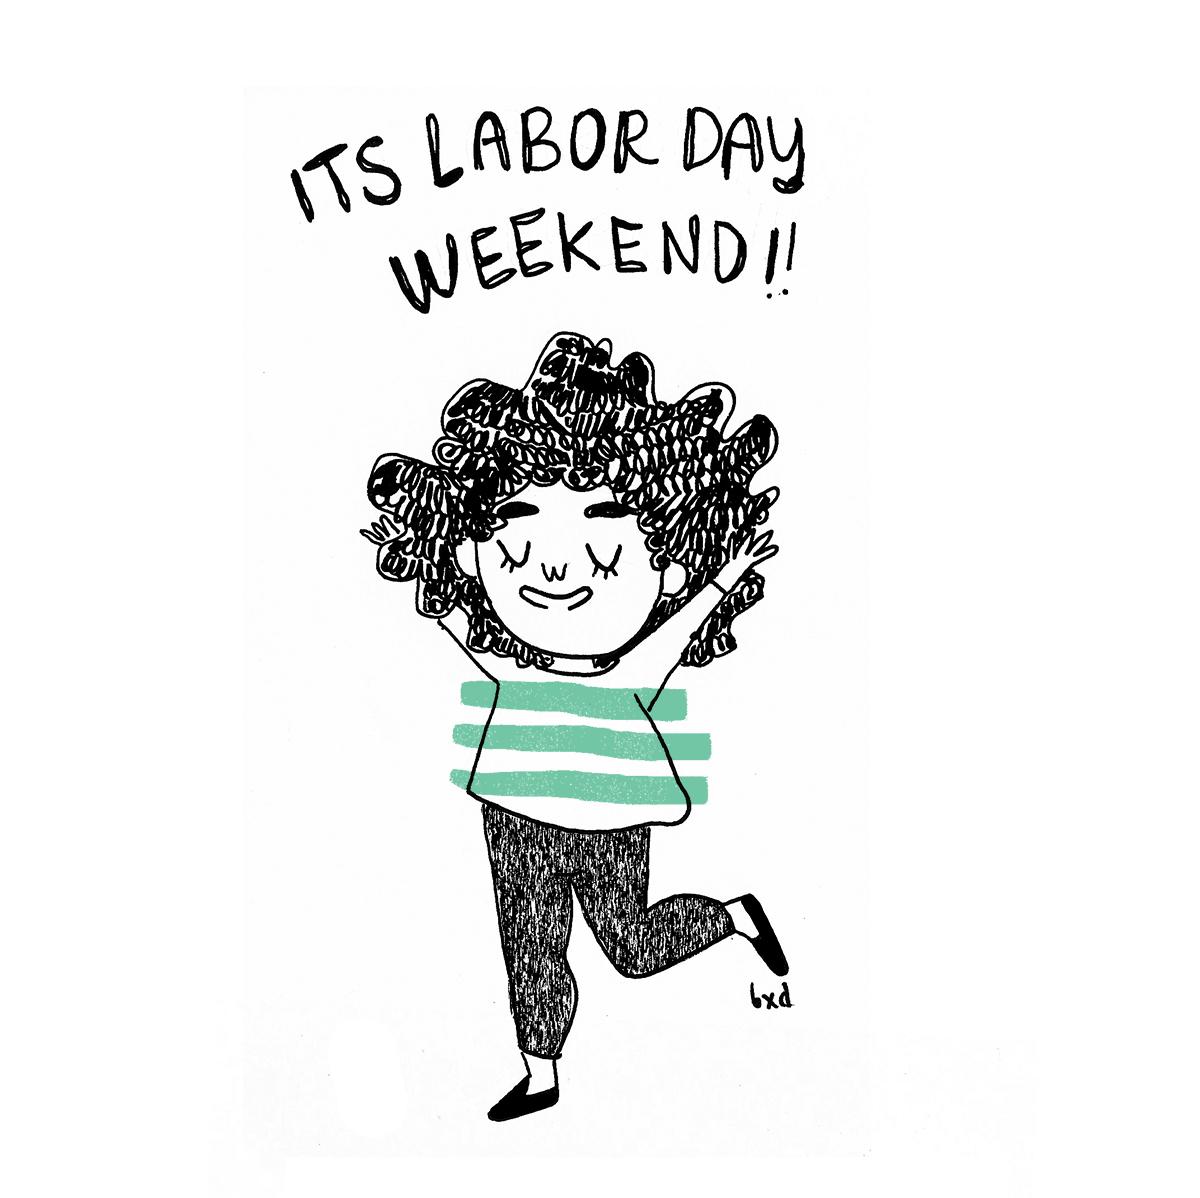 labordayweekendcc